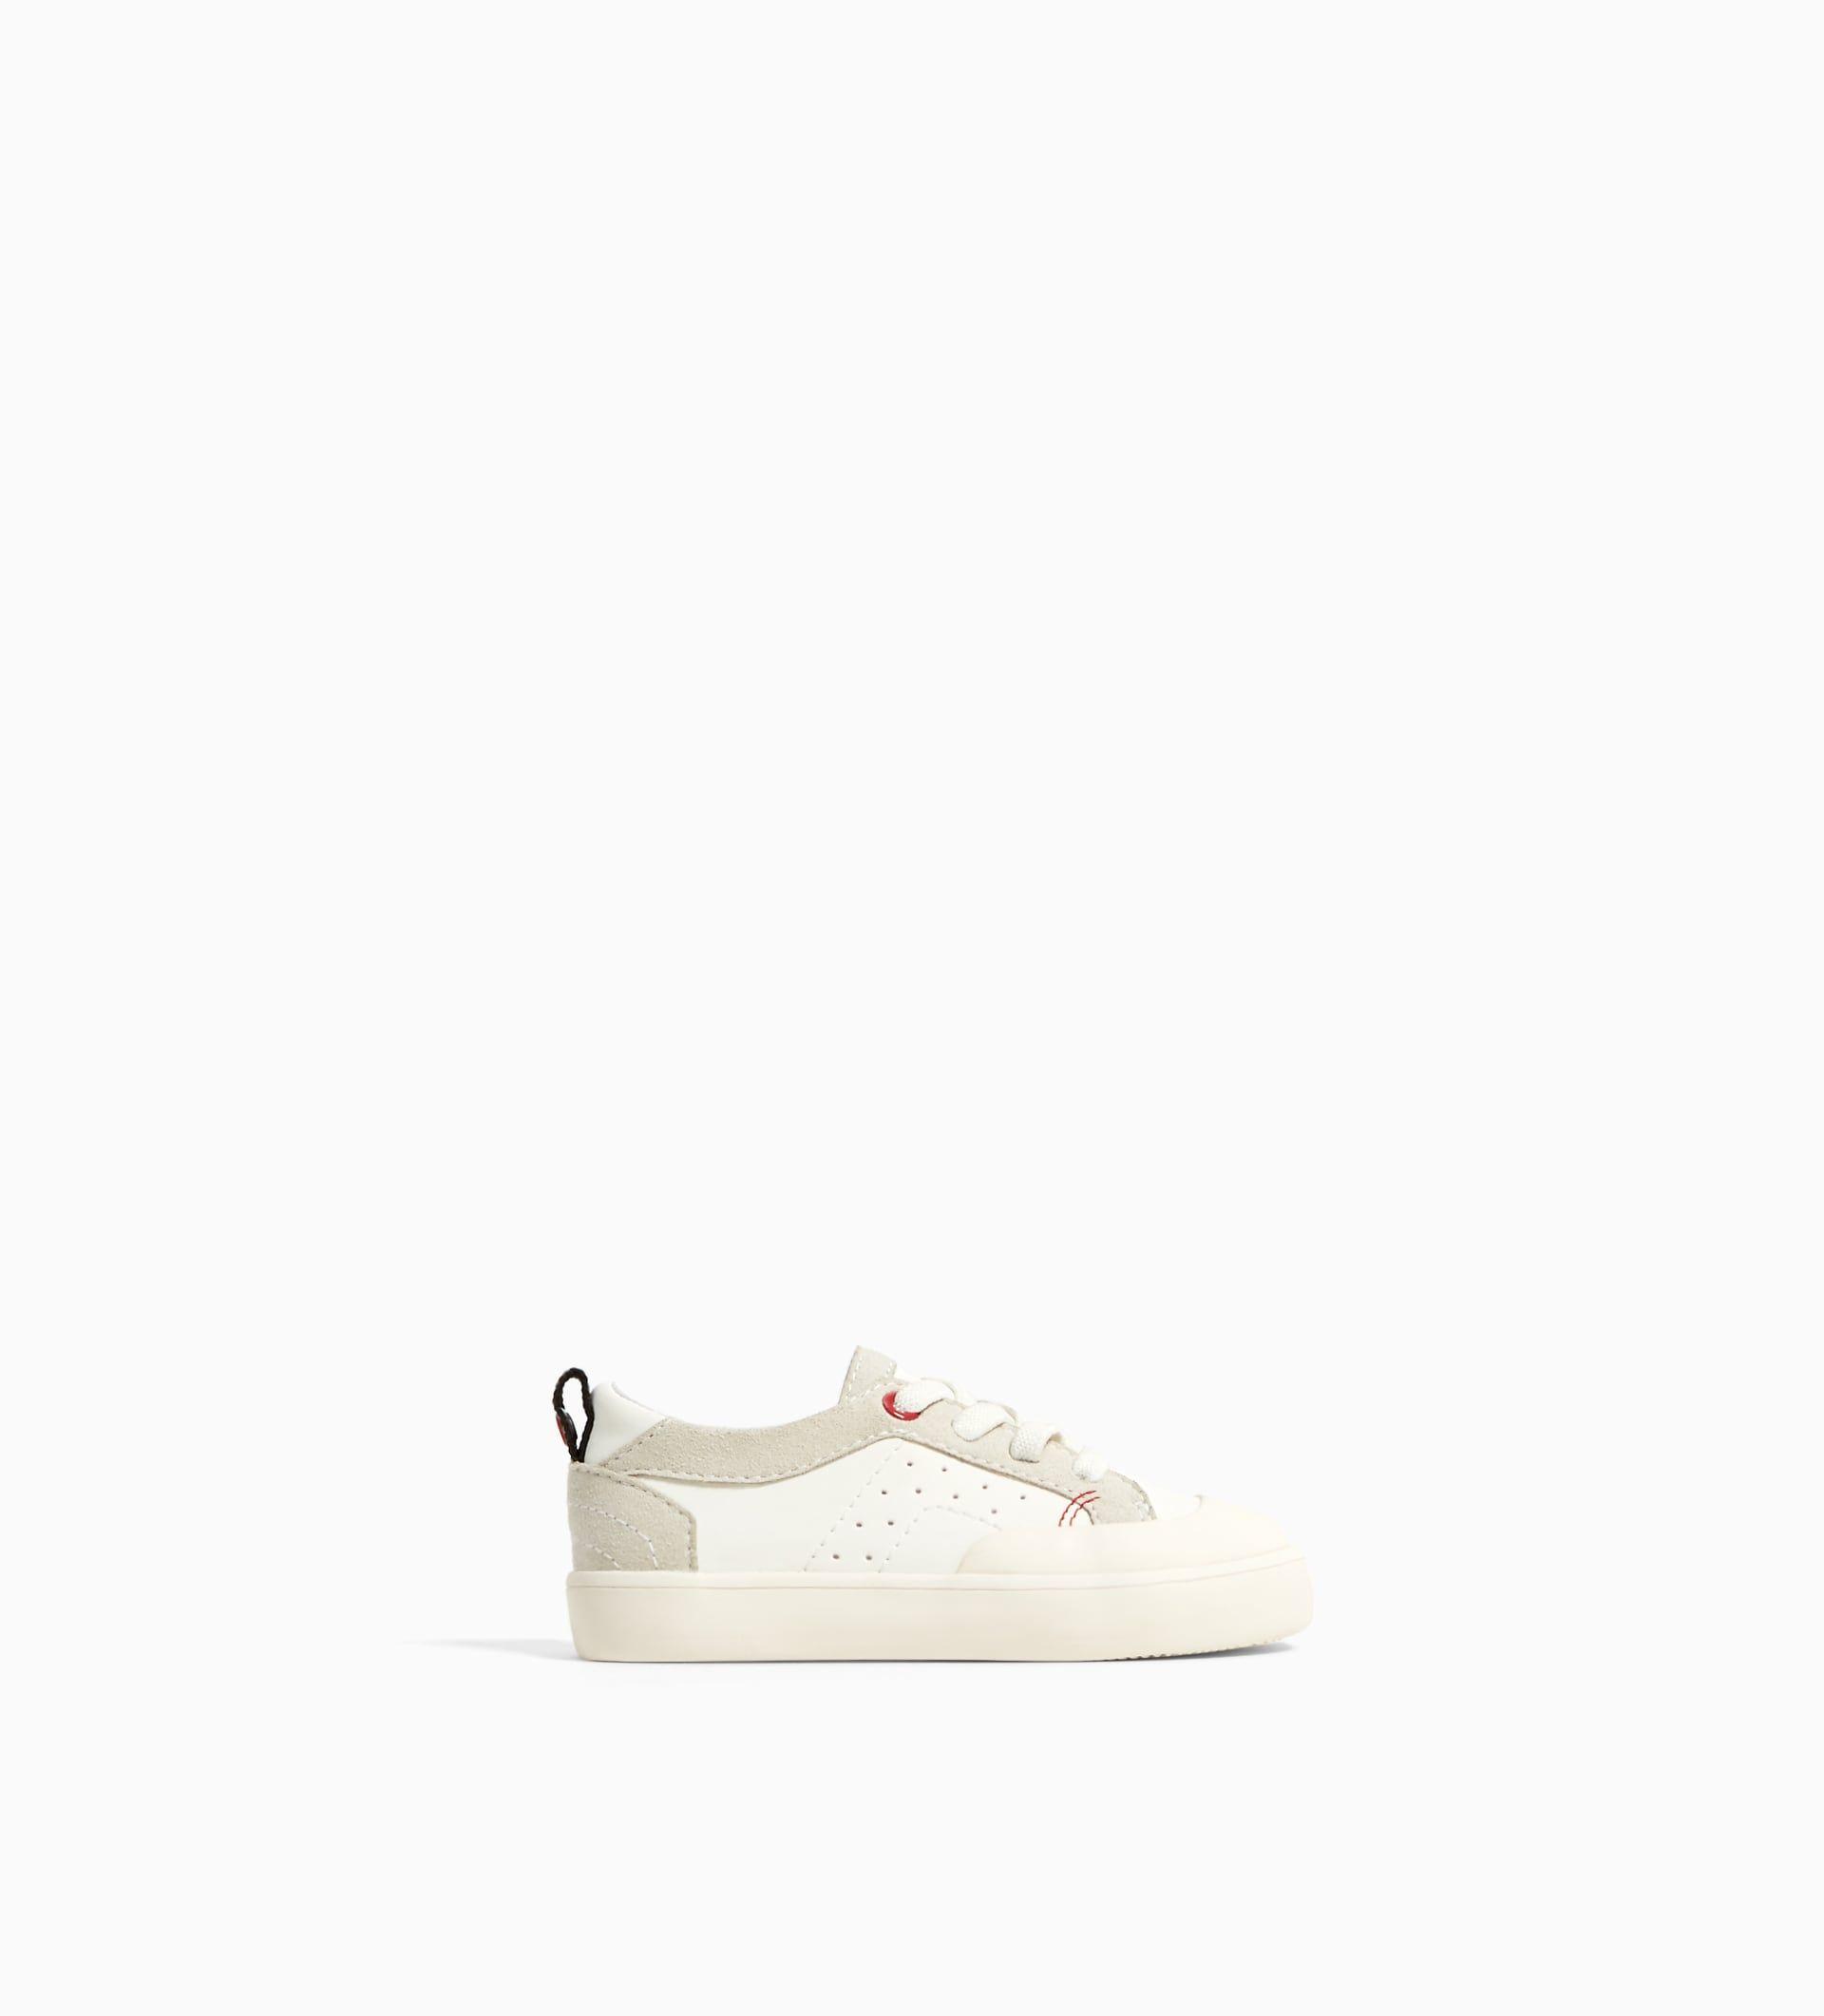 Zara   Sneakers, Plimsolls